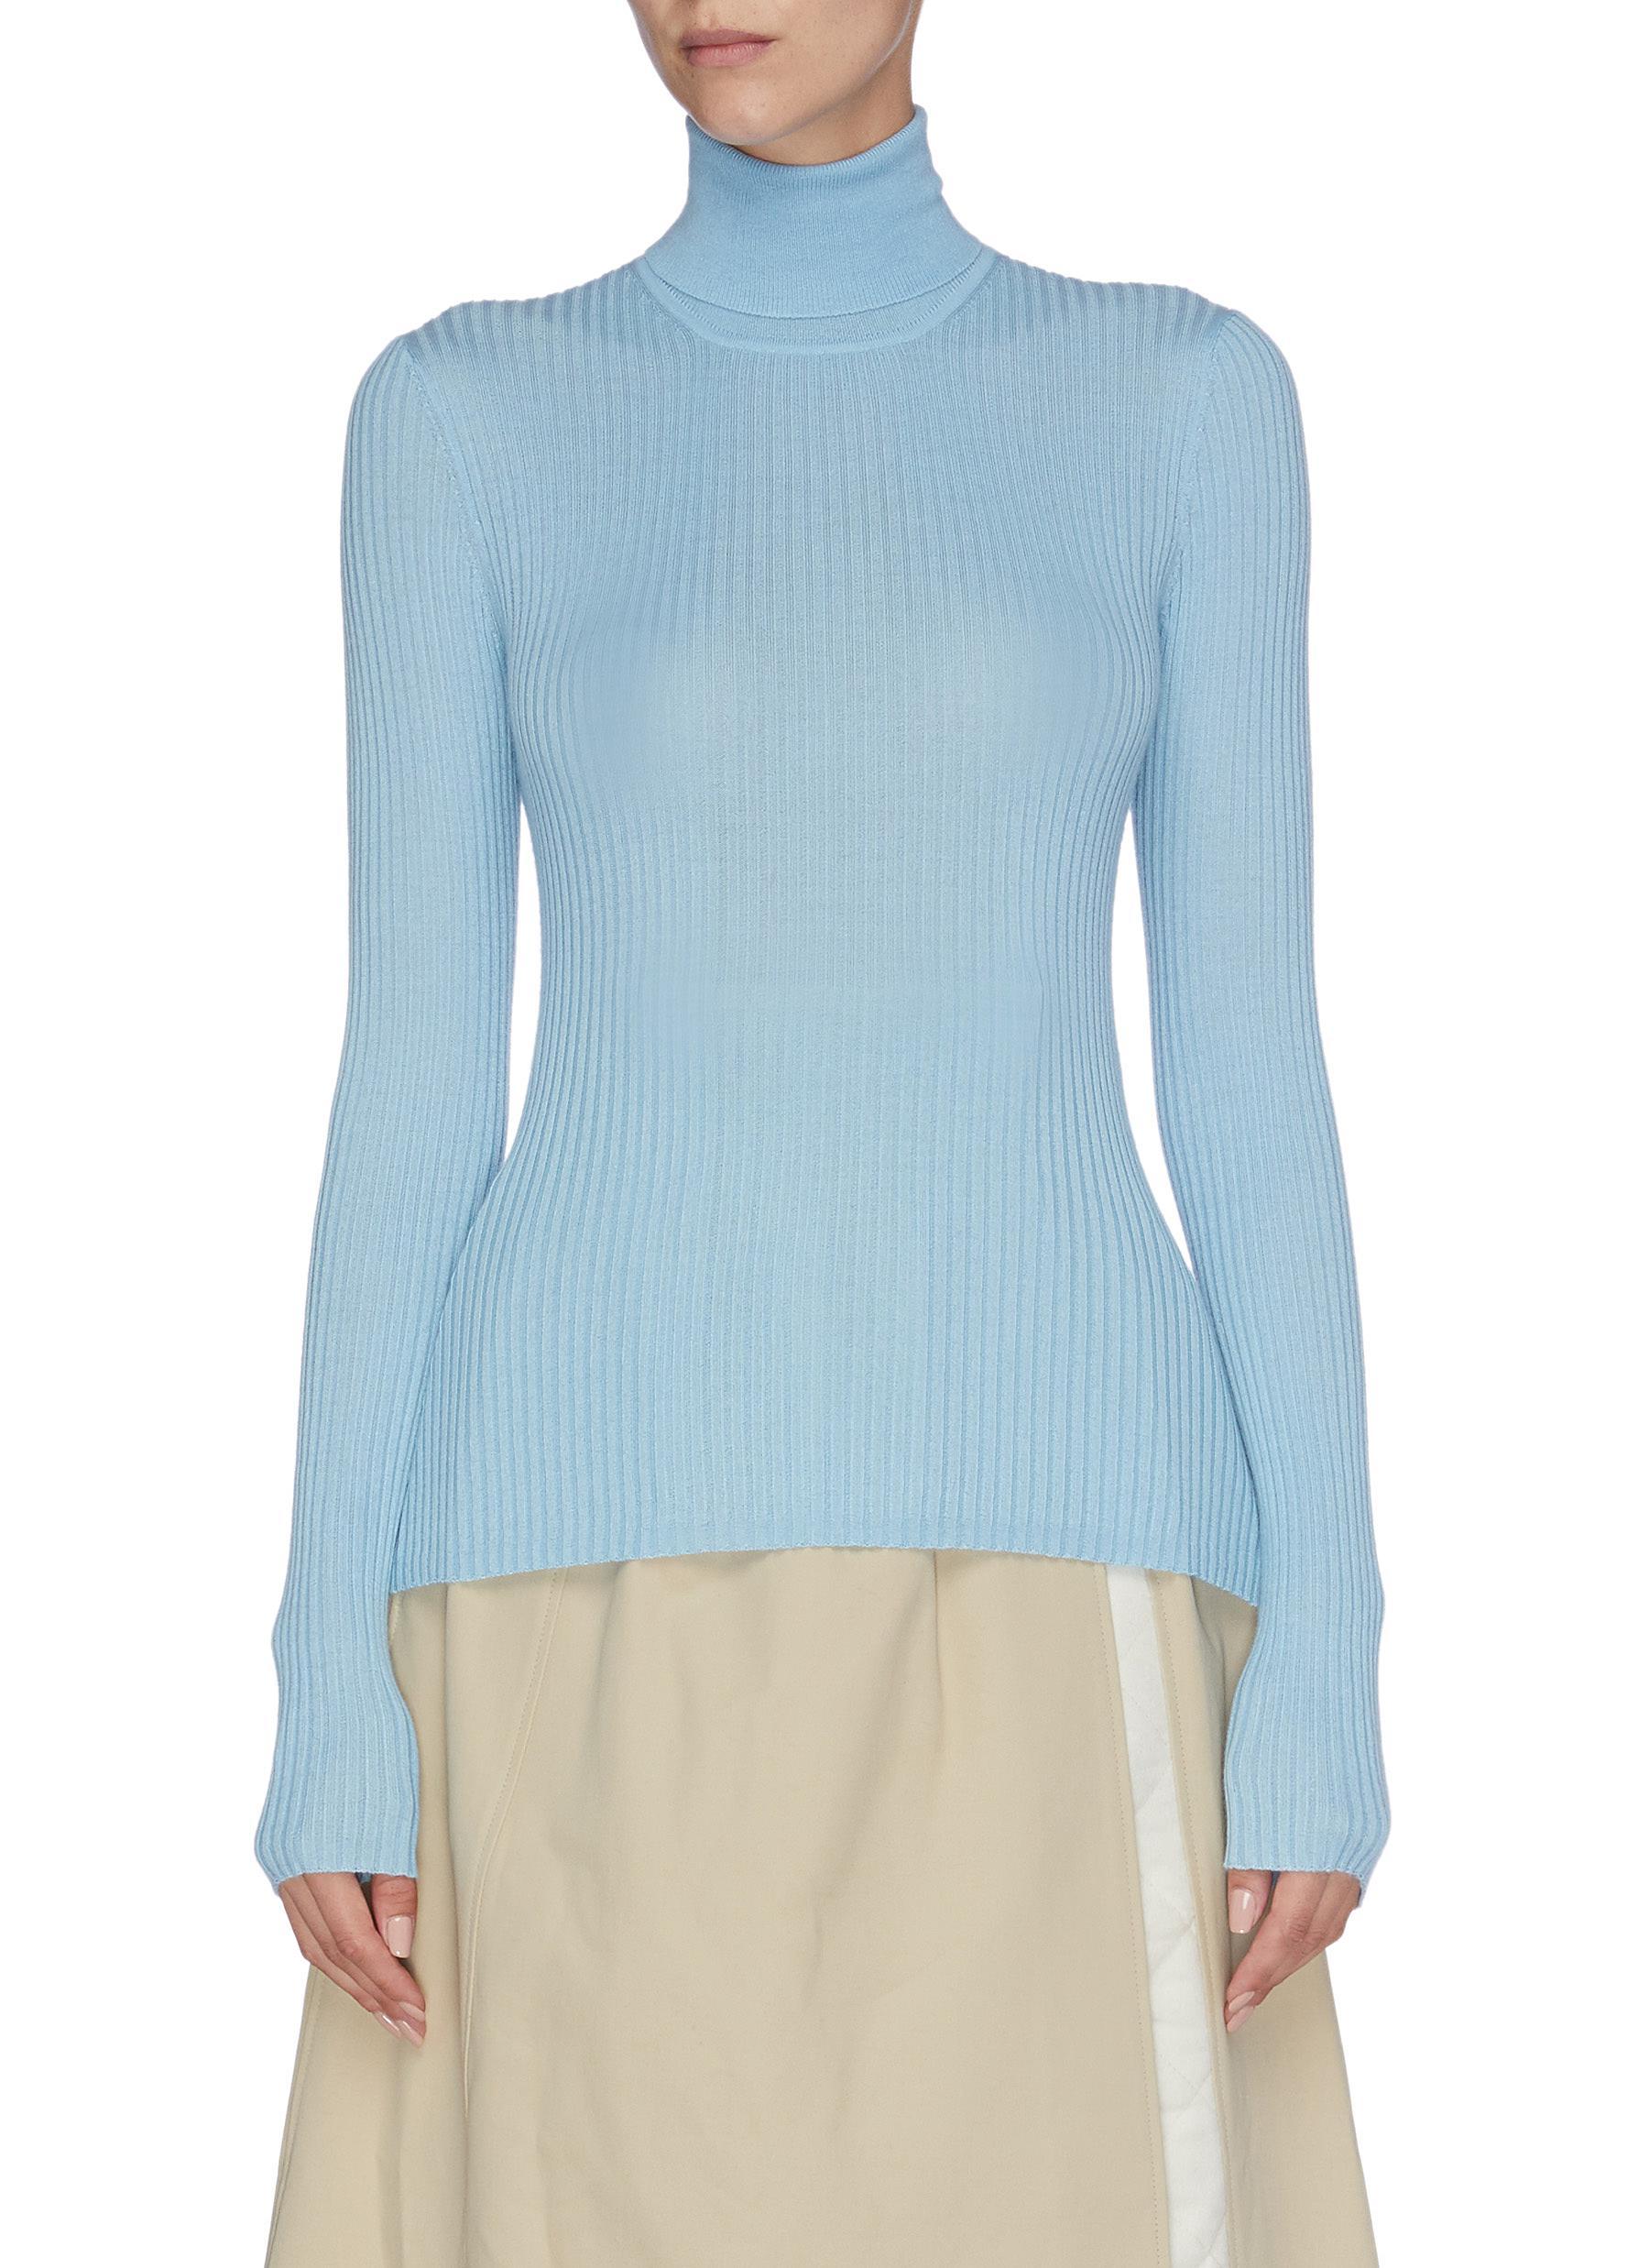 Peppe cashmere-silk rib knit turtleneck top by Gabriela Hearst